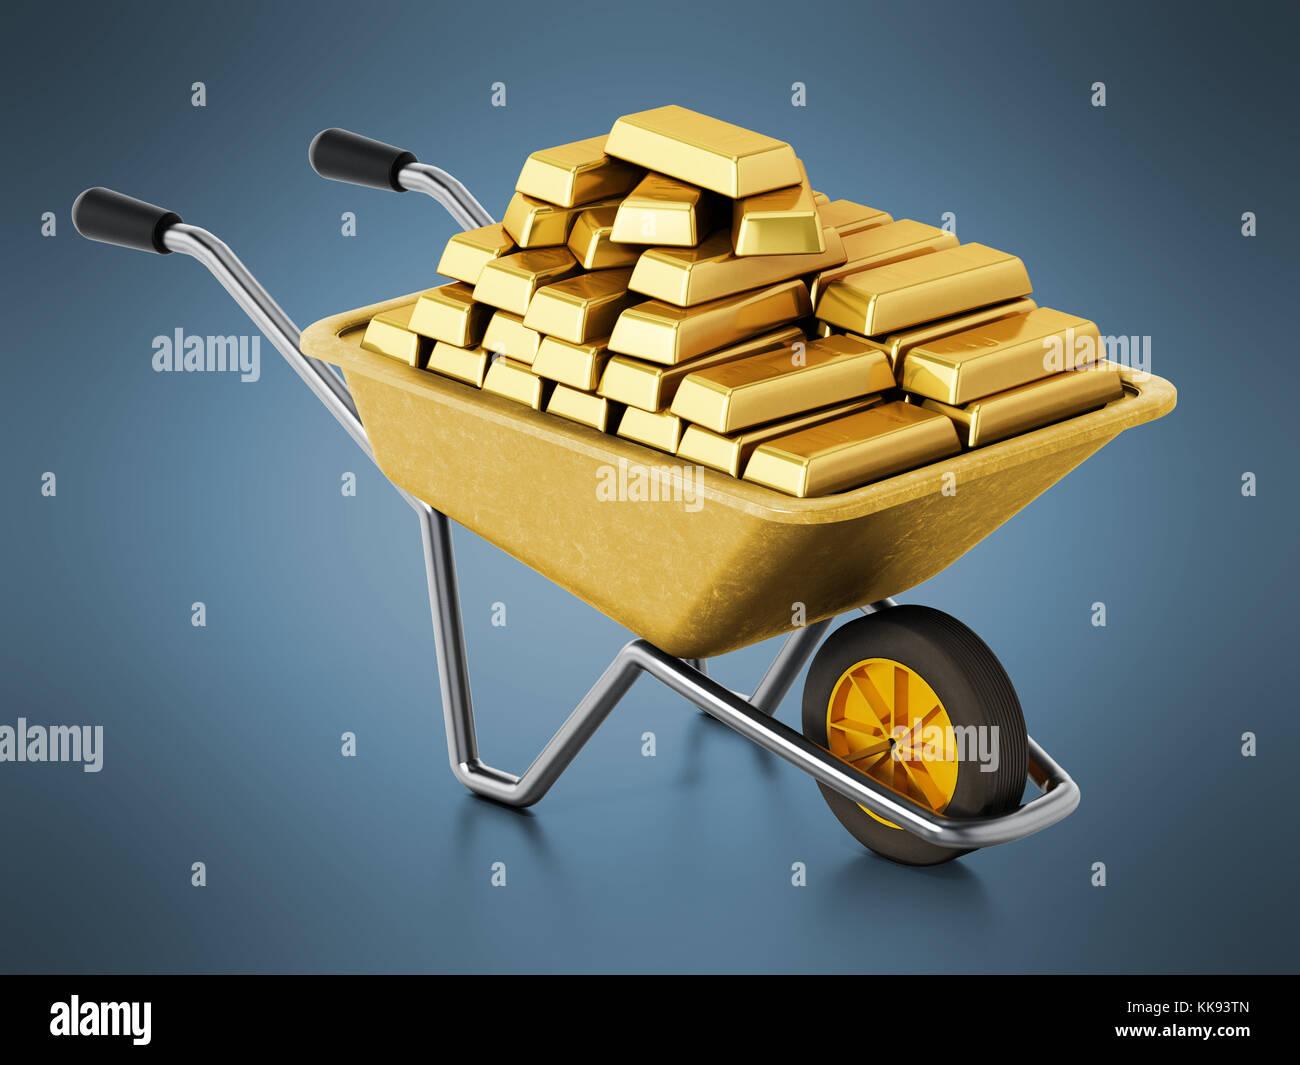 Wheelbarrow full of gold on blue background. 3D illustration. - Stock Image